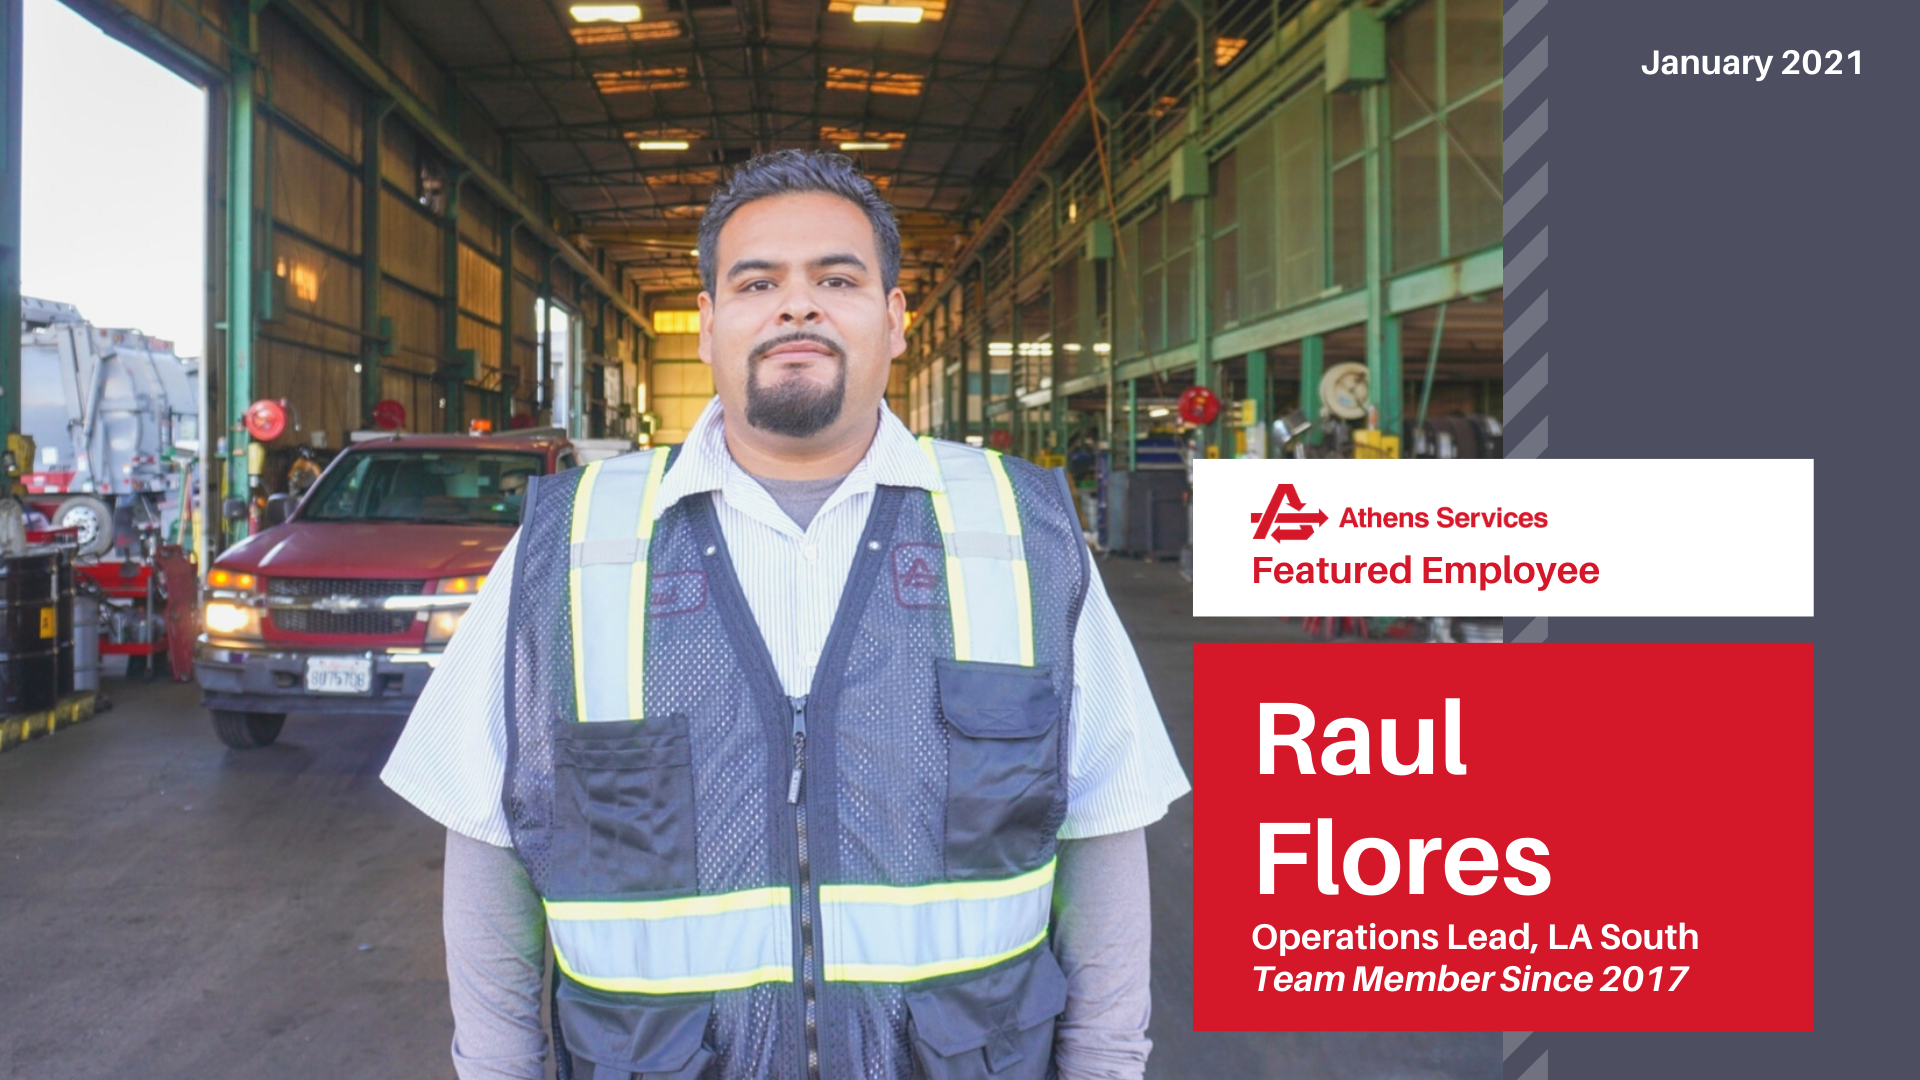 Raul Flores Employee Highlight (1)